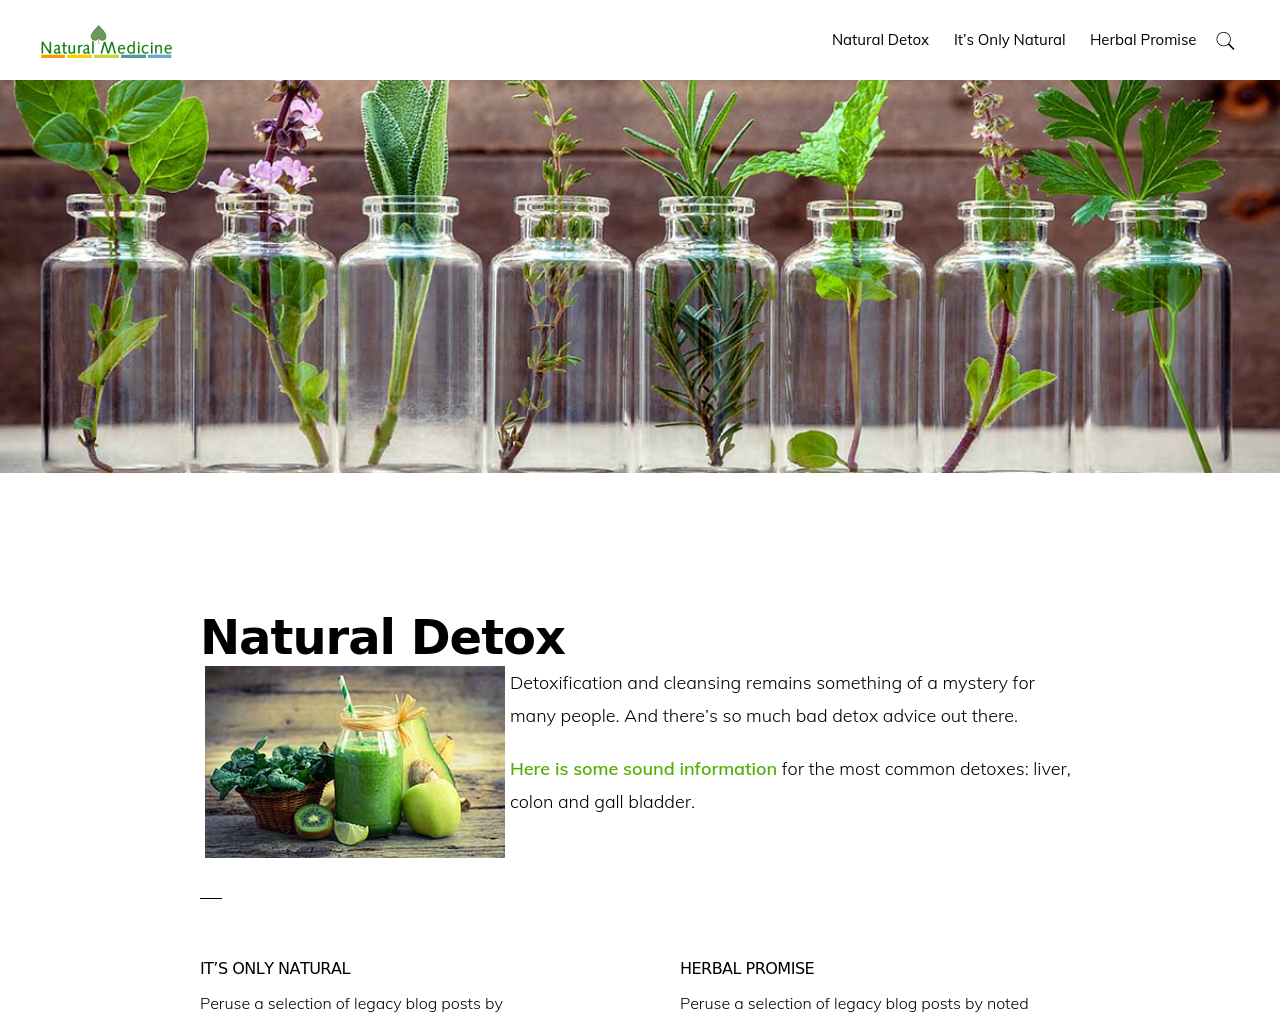 Natural-Medicine-Advertising-Reviews-Pricing